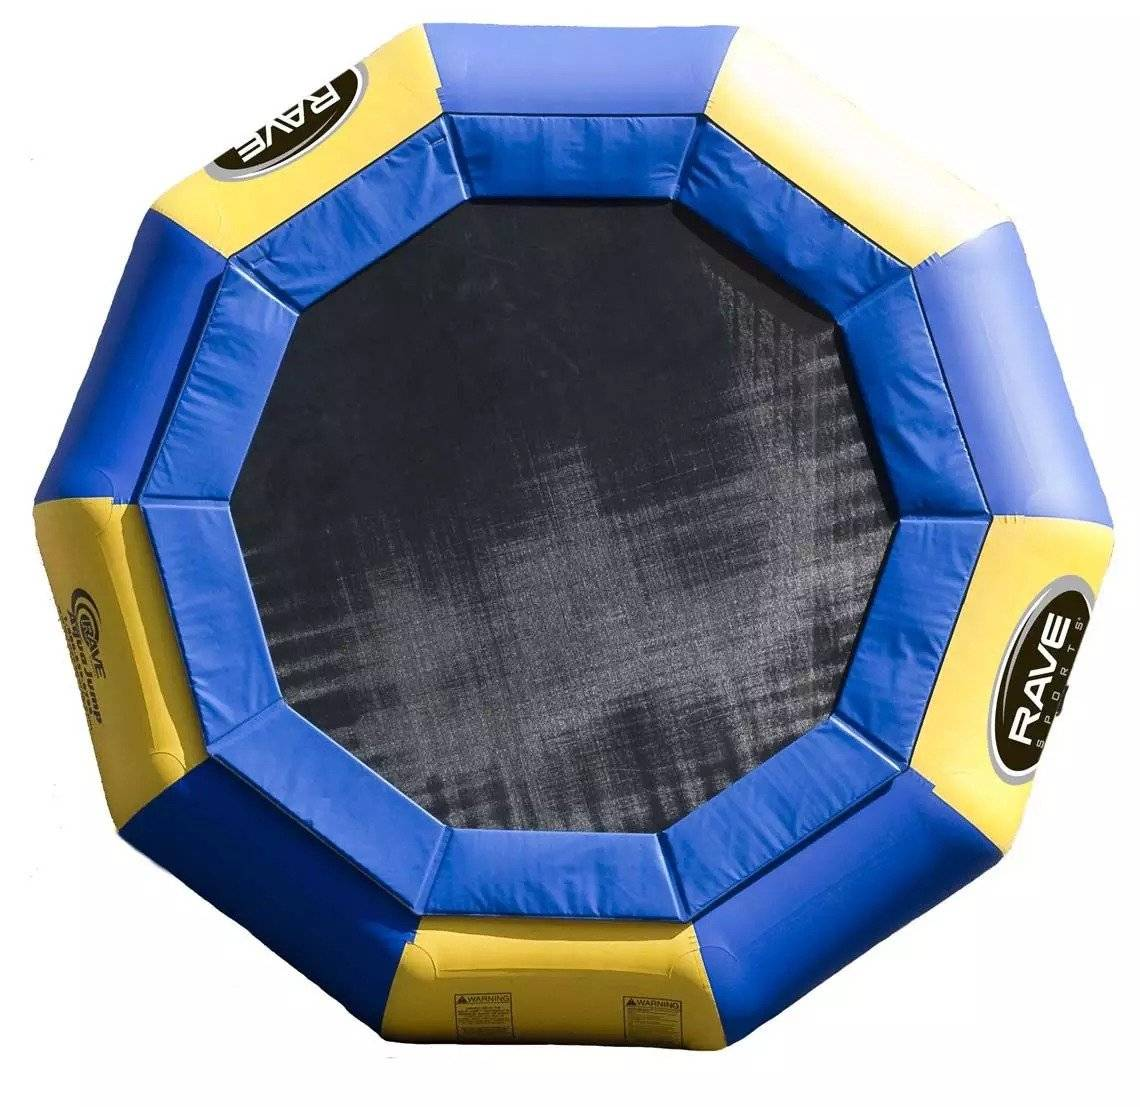 Rave Sports Trampoline – Rave Sports – Aqua Jump Eclipse 150 – 457cm (15ft) vanntrampoline